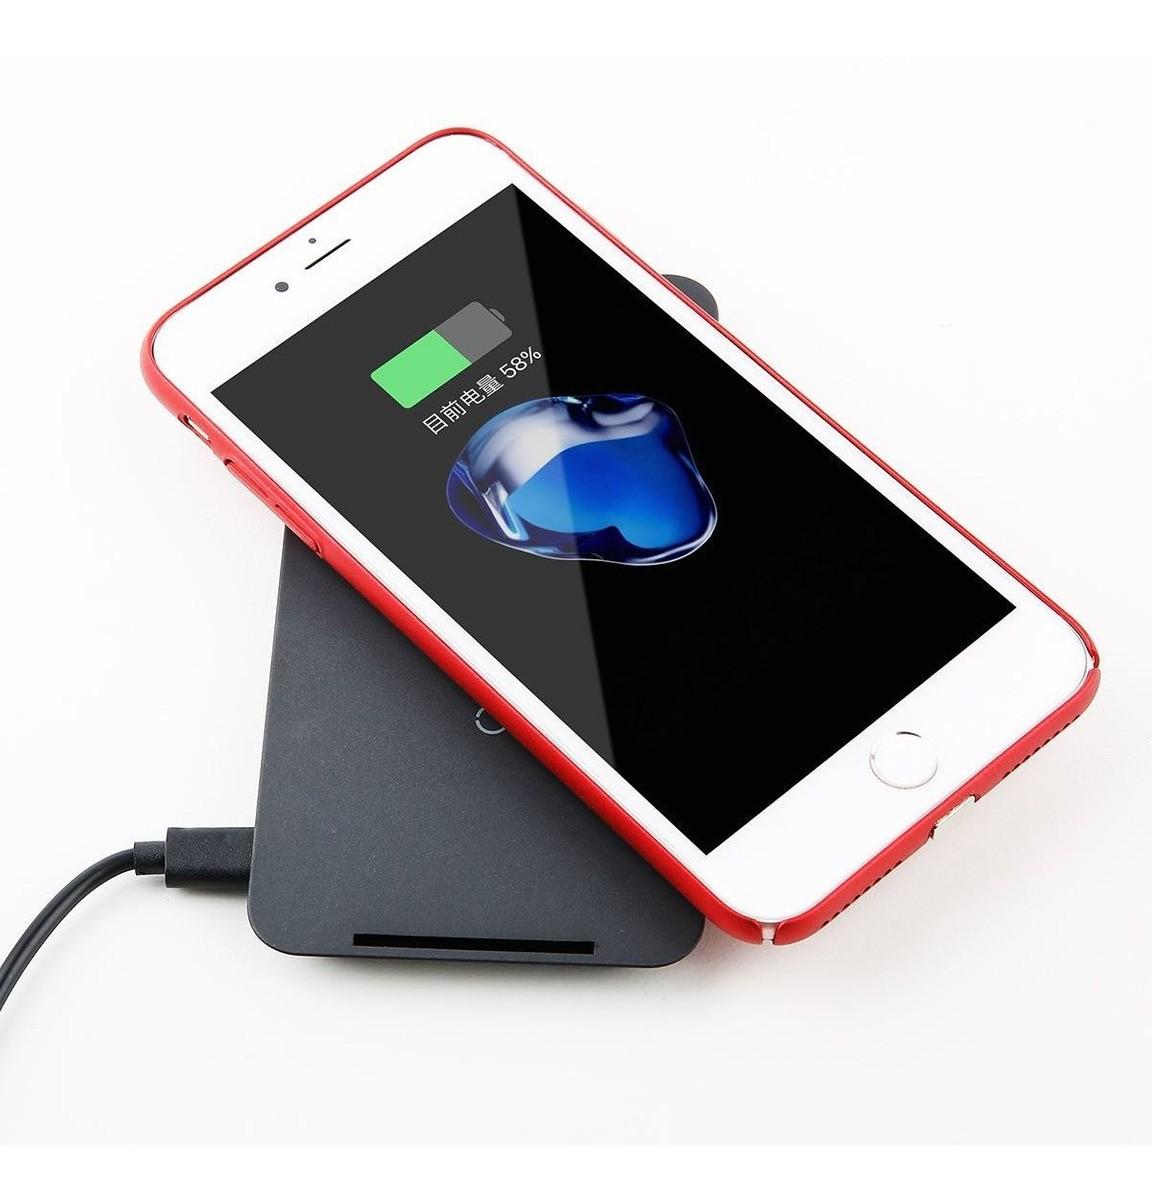 Receptor adaptador Para Iphone Carregar Sem Fio Baseus Legitimo